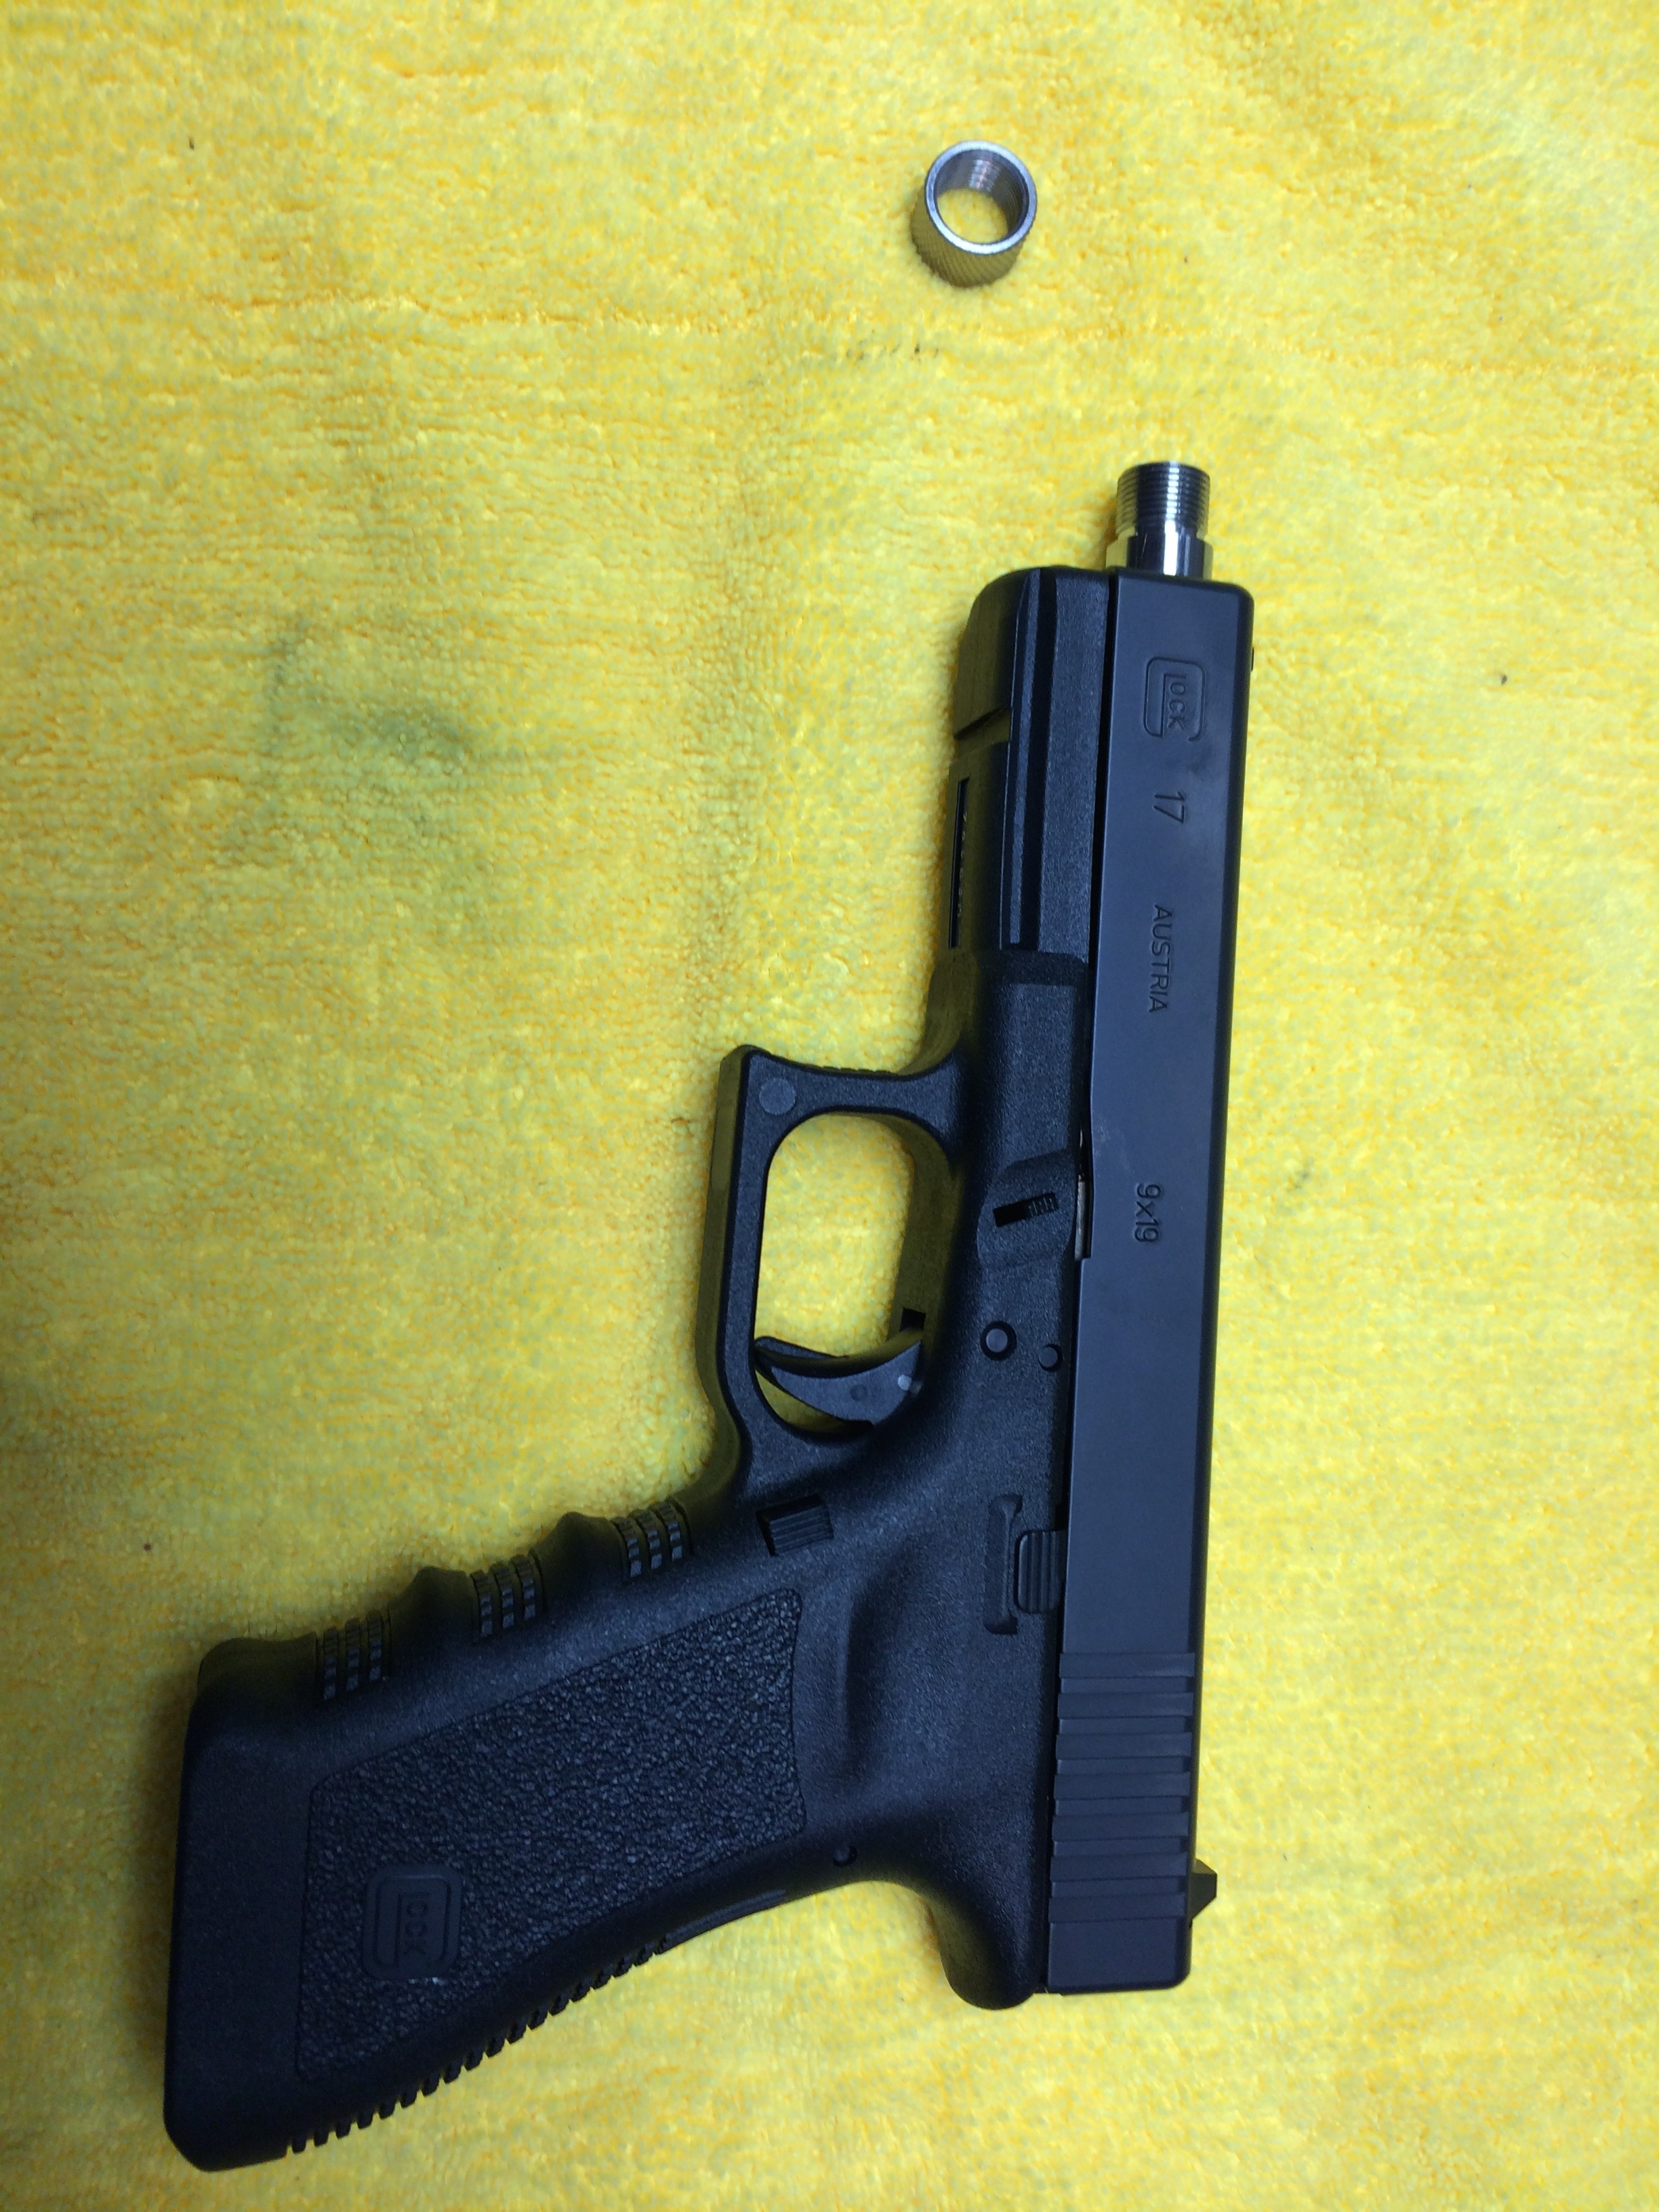 Glock 17, Lone Wolf barrel and raised sights-img_0259.jpg